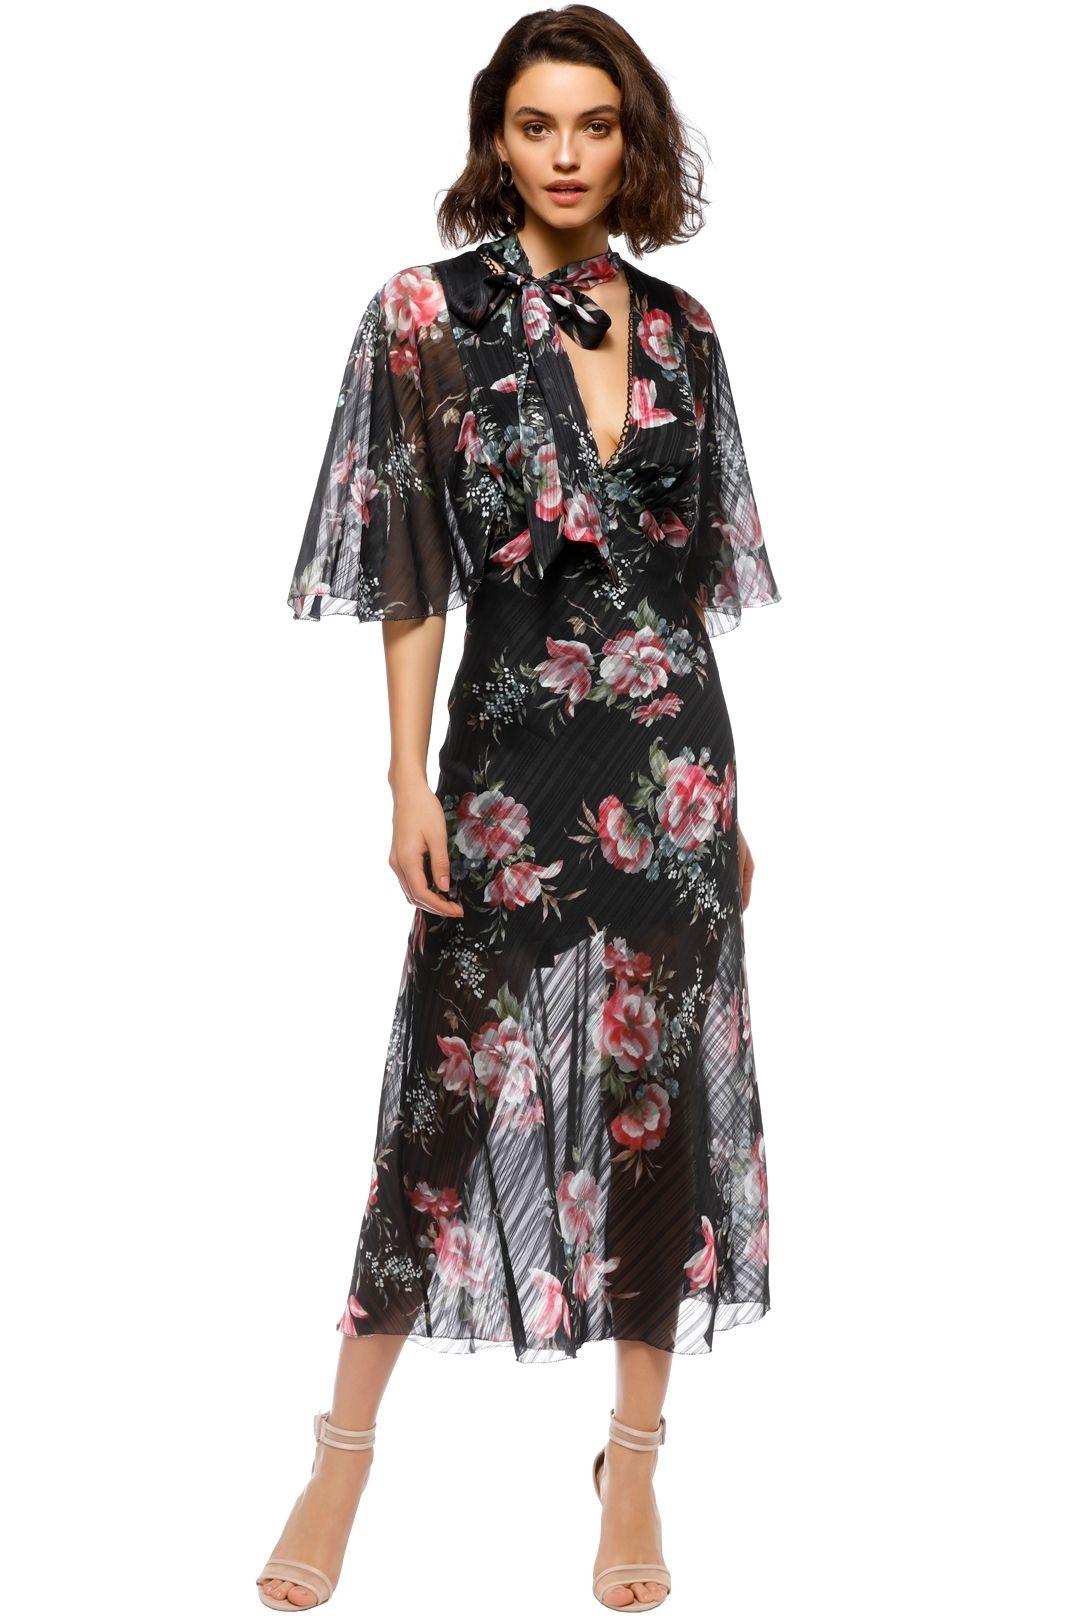 Talulah - Belonging Midi Dress - Black Floral - Front